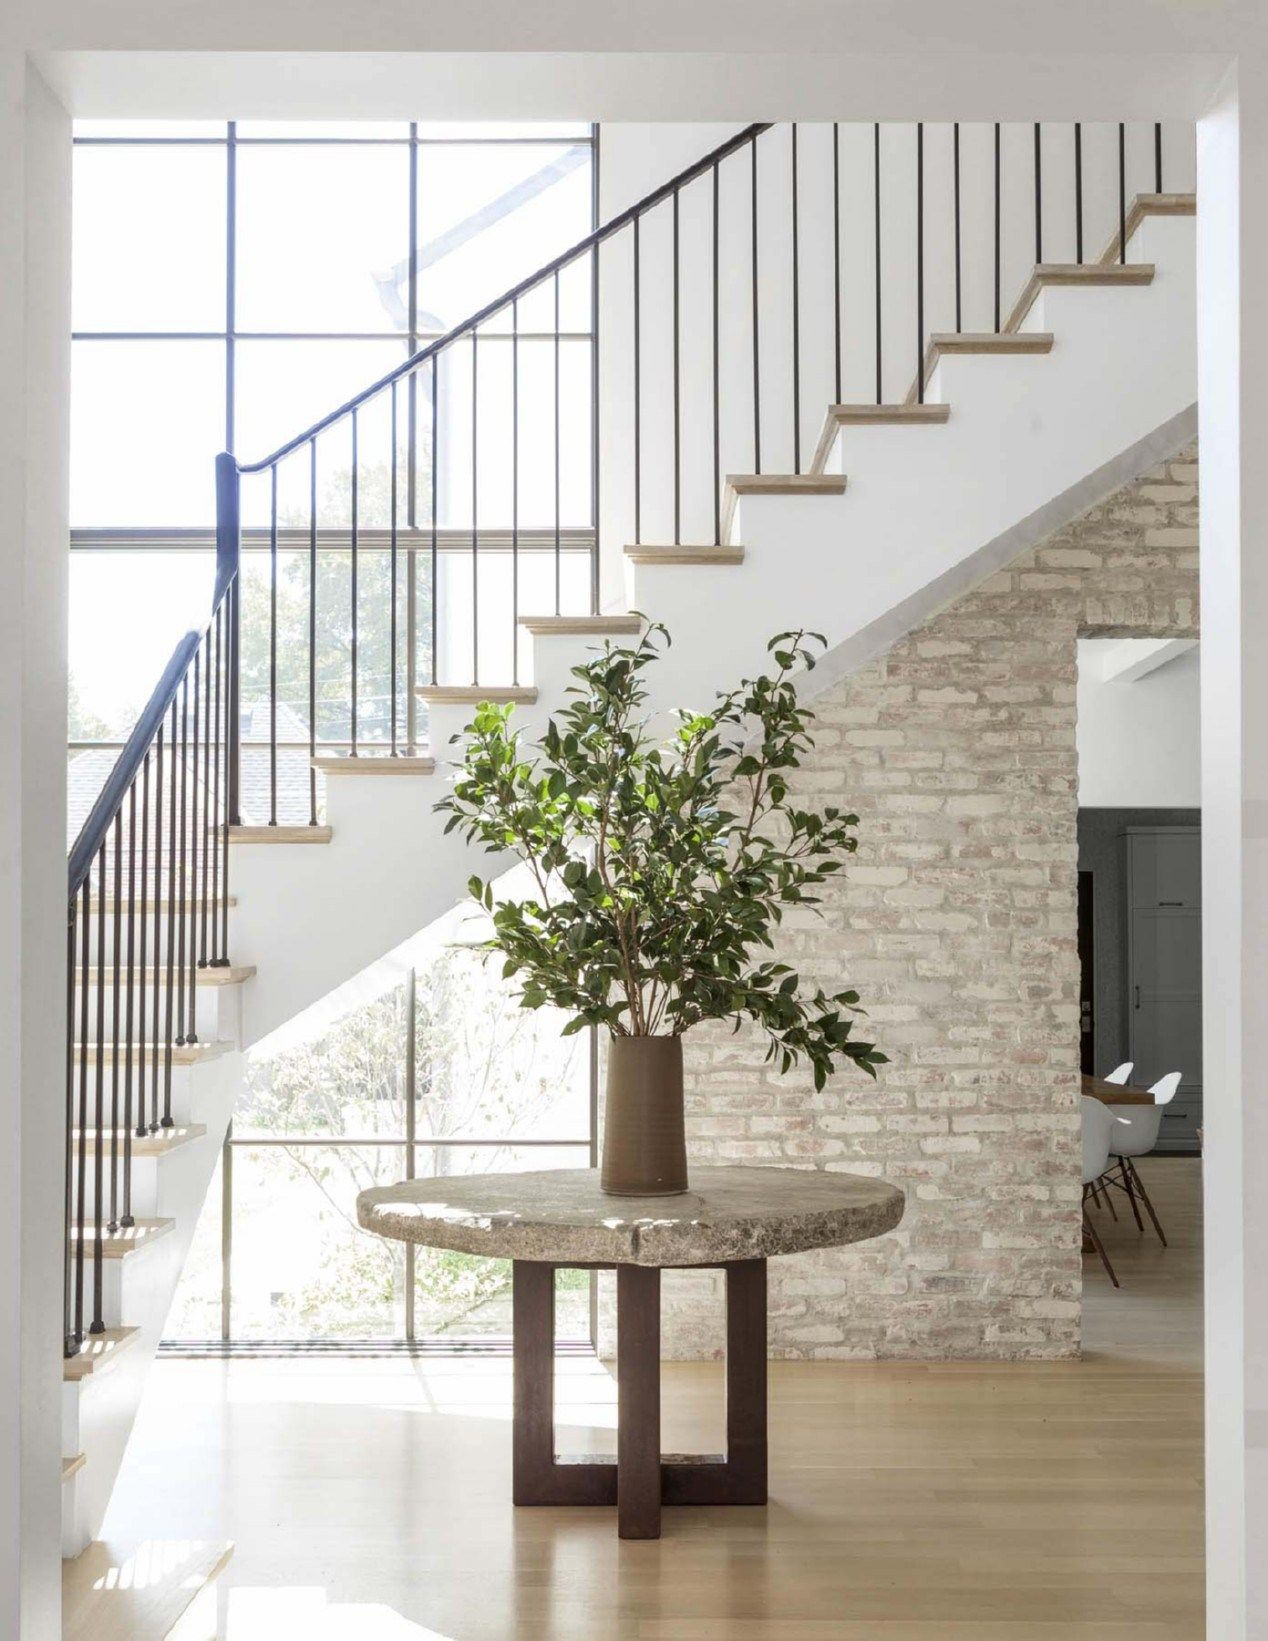 Awesome modern mediterranean homes interior design ideas (34 ...